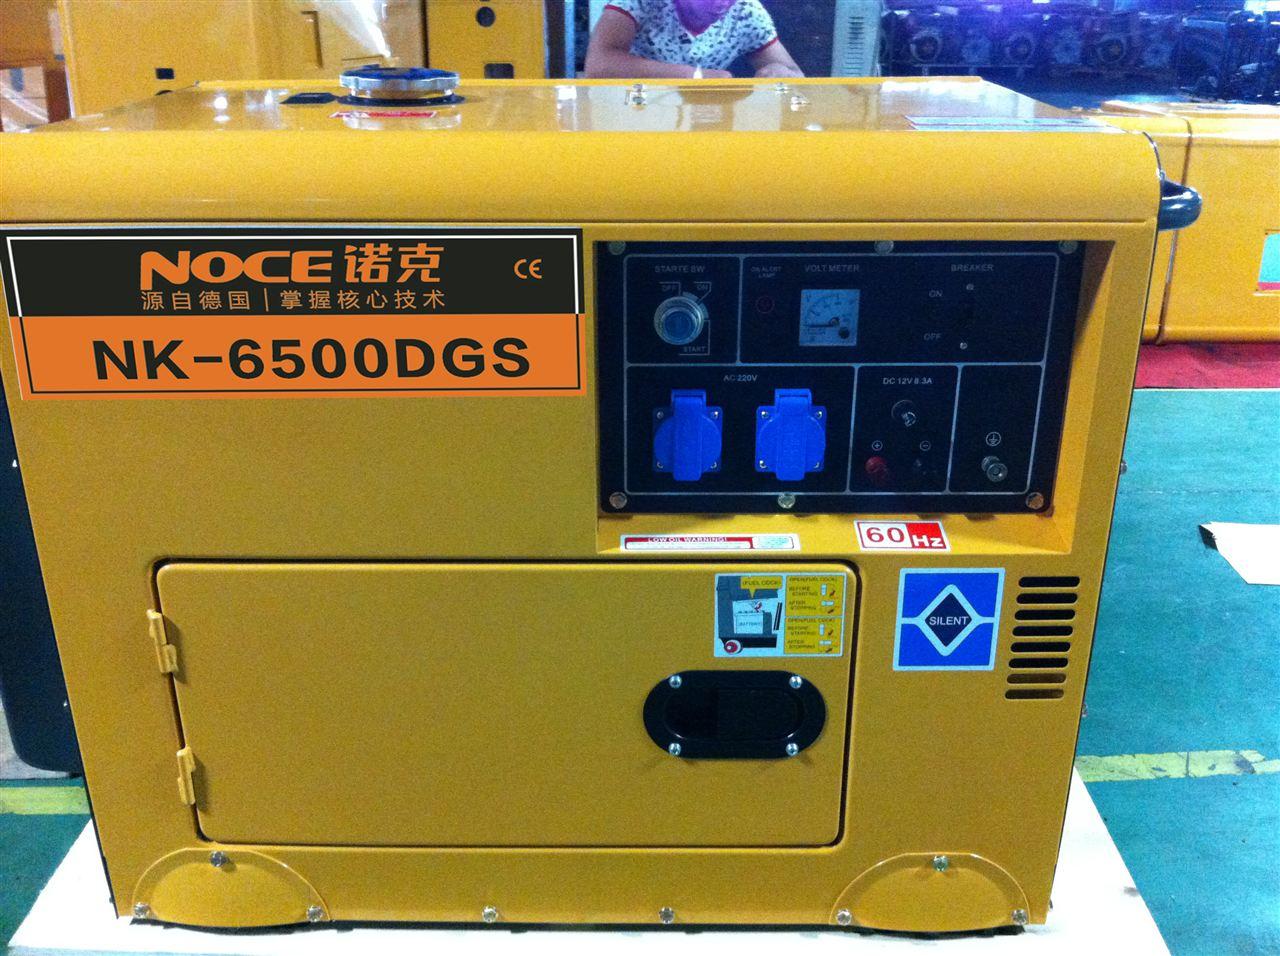 6kw柴油发电机【静音】nk-6500dgs